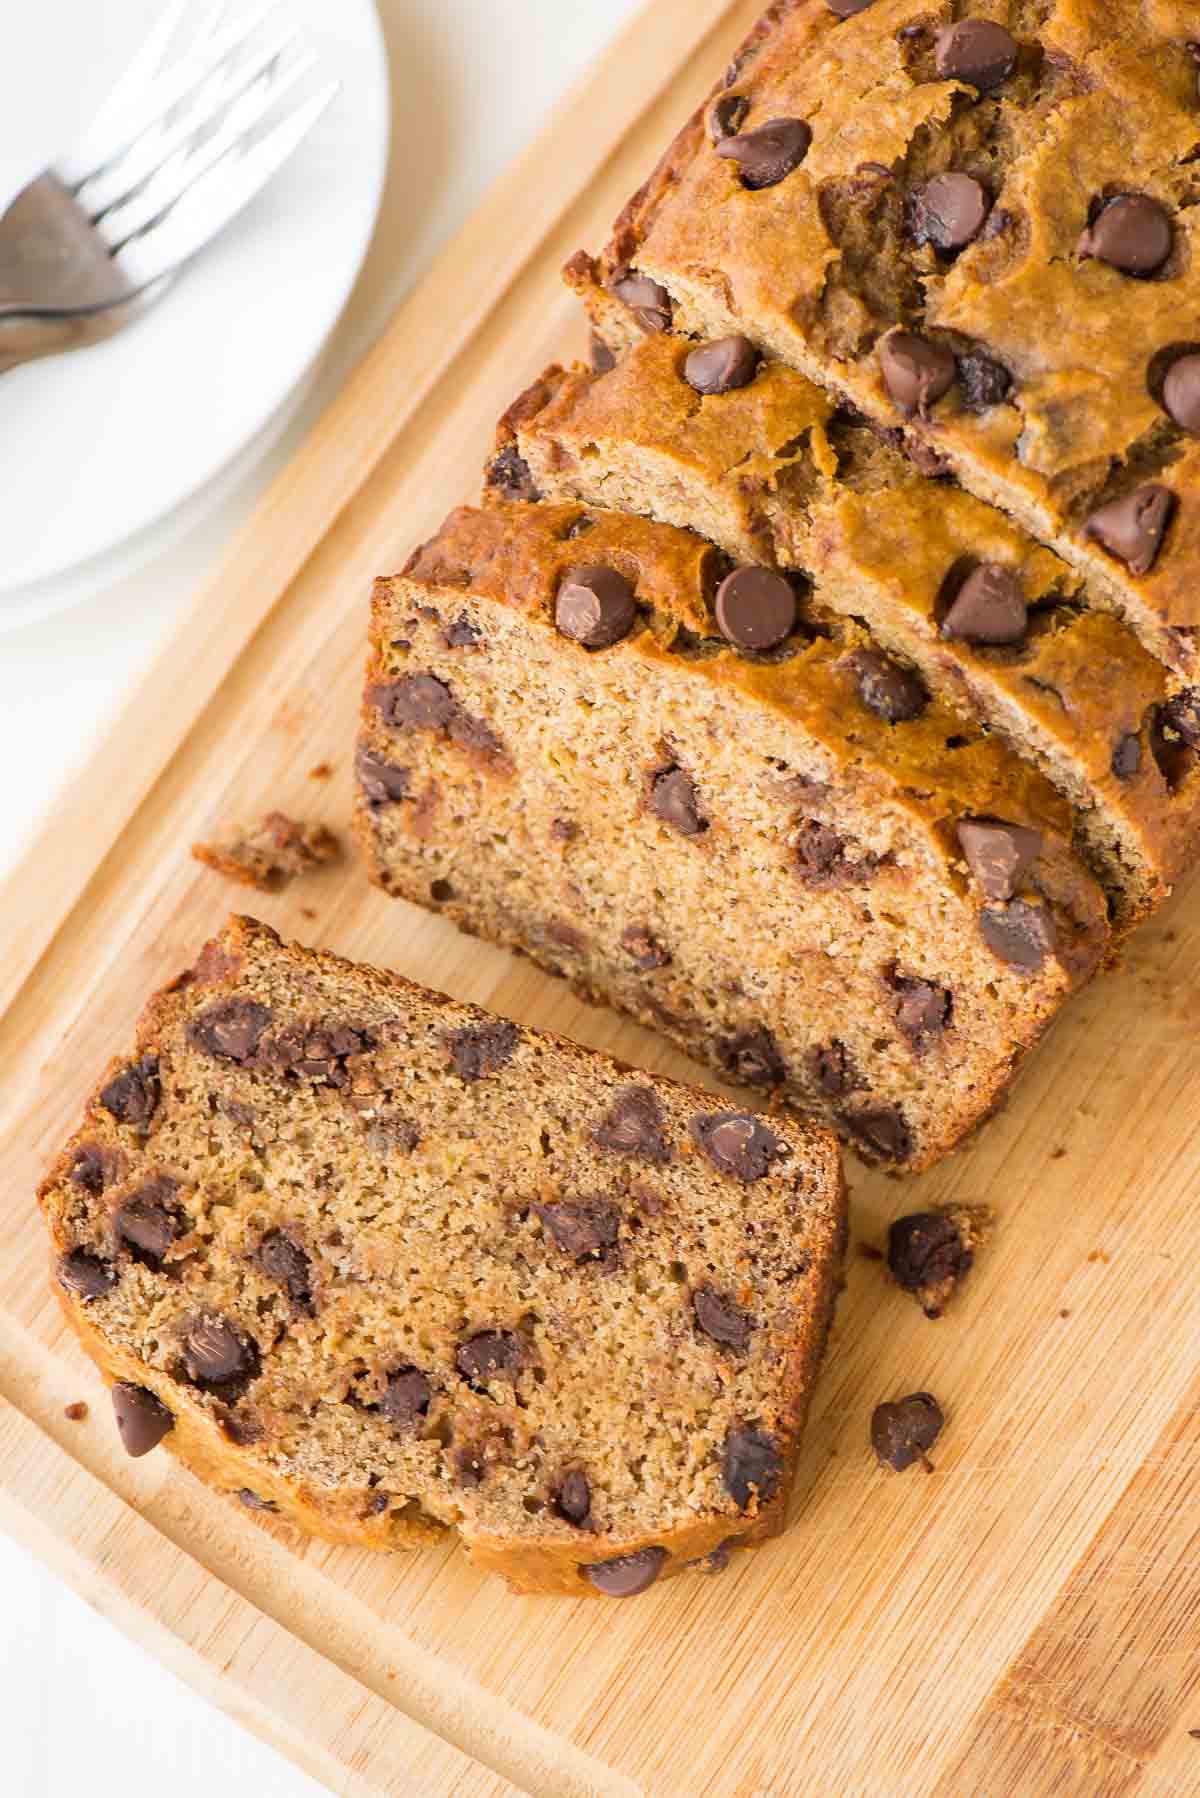 Recipes For Healthy Banana Bread  Healthy Banana Bread Recipe with Chocolate Chips